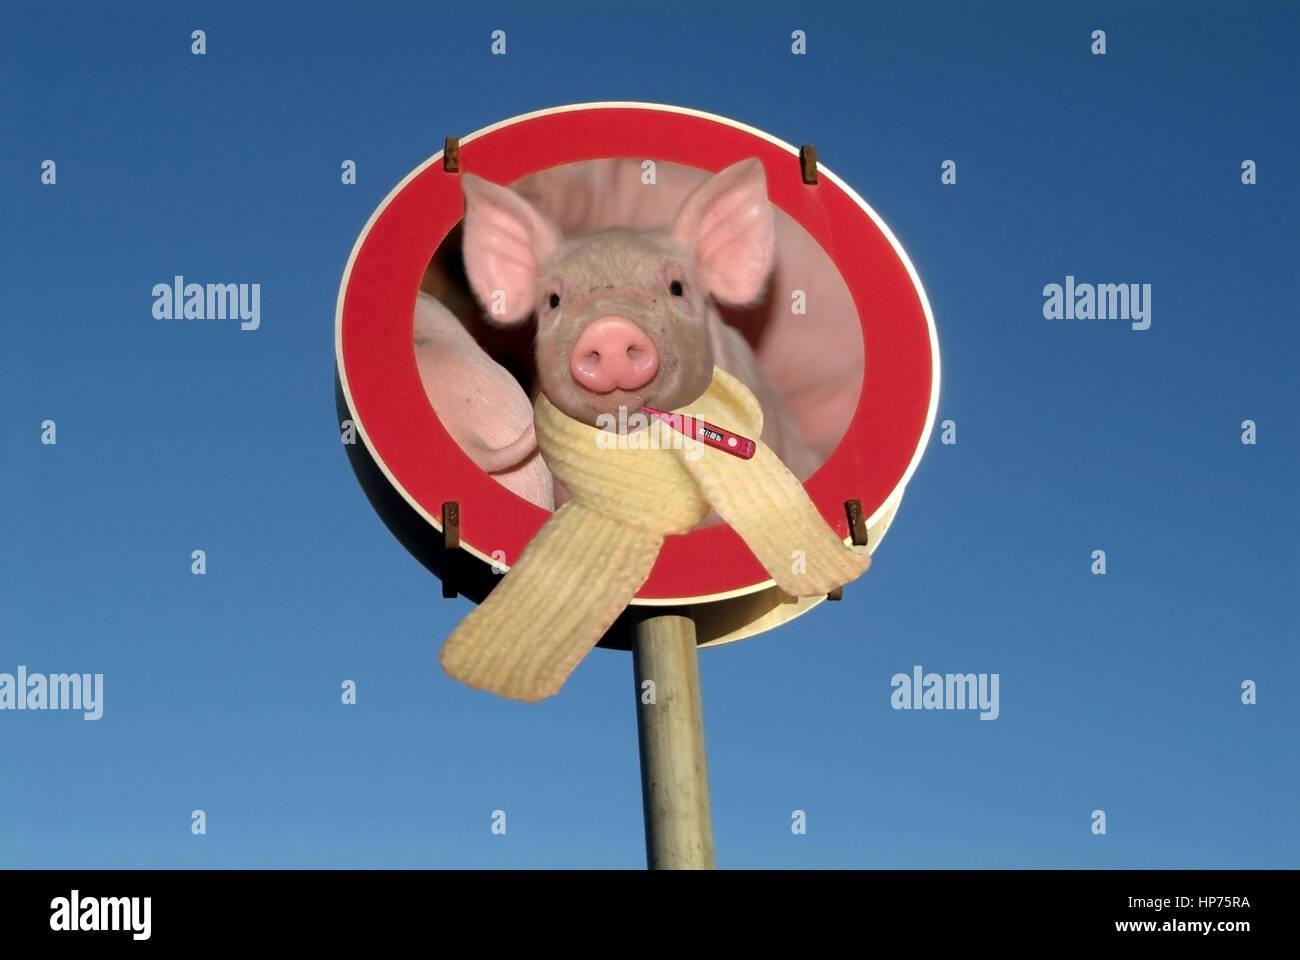 Symbolbild Schweinegrippe - symbolic for swine influenza - Stock Image